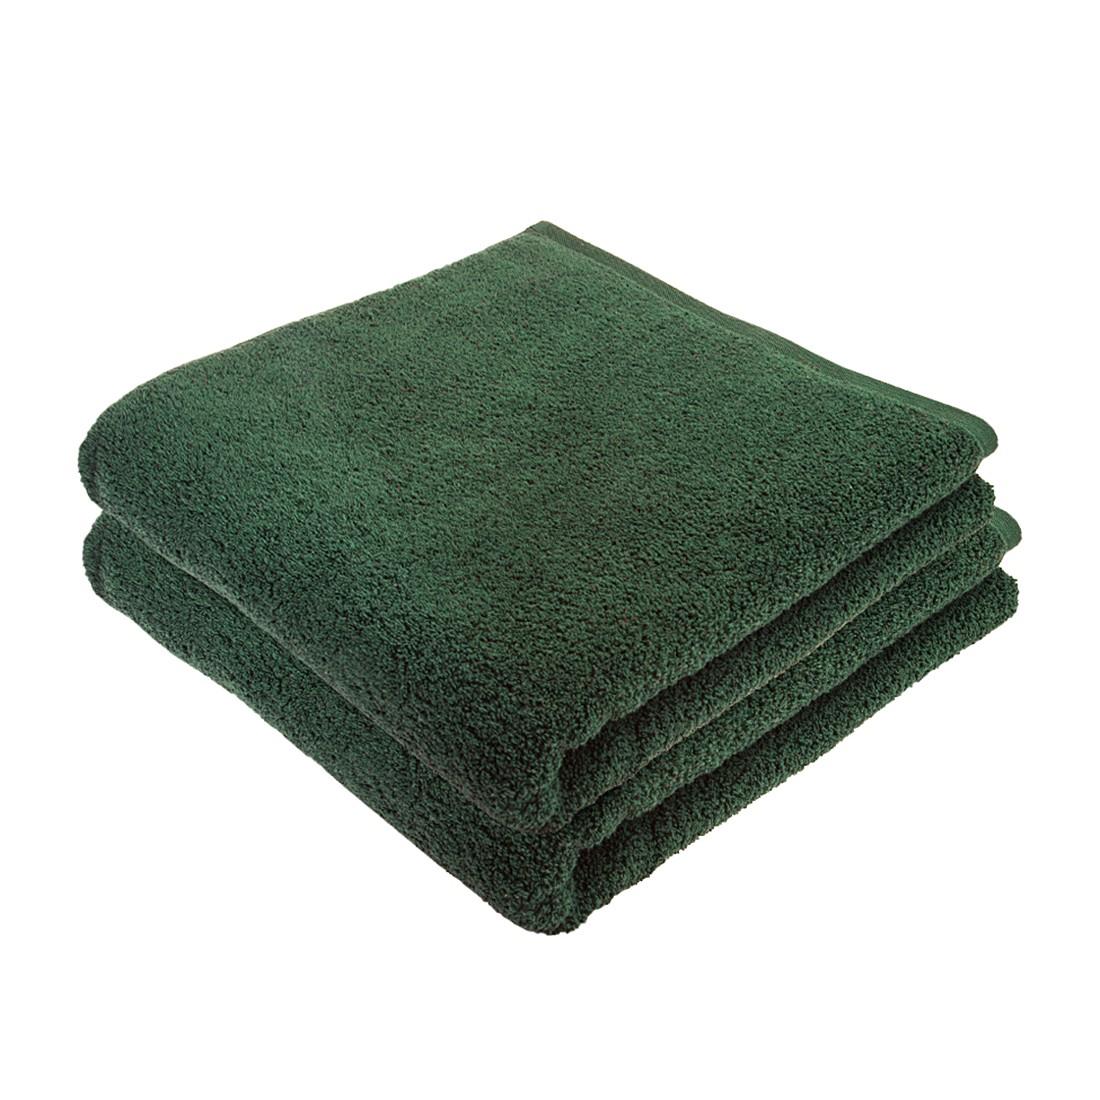 Home 24 - Service de bain pure (lot de 2) - coton - vert, stilana